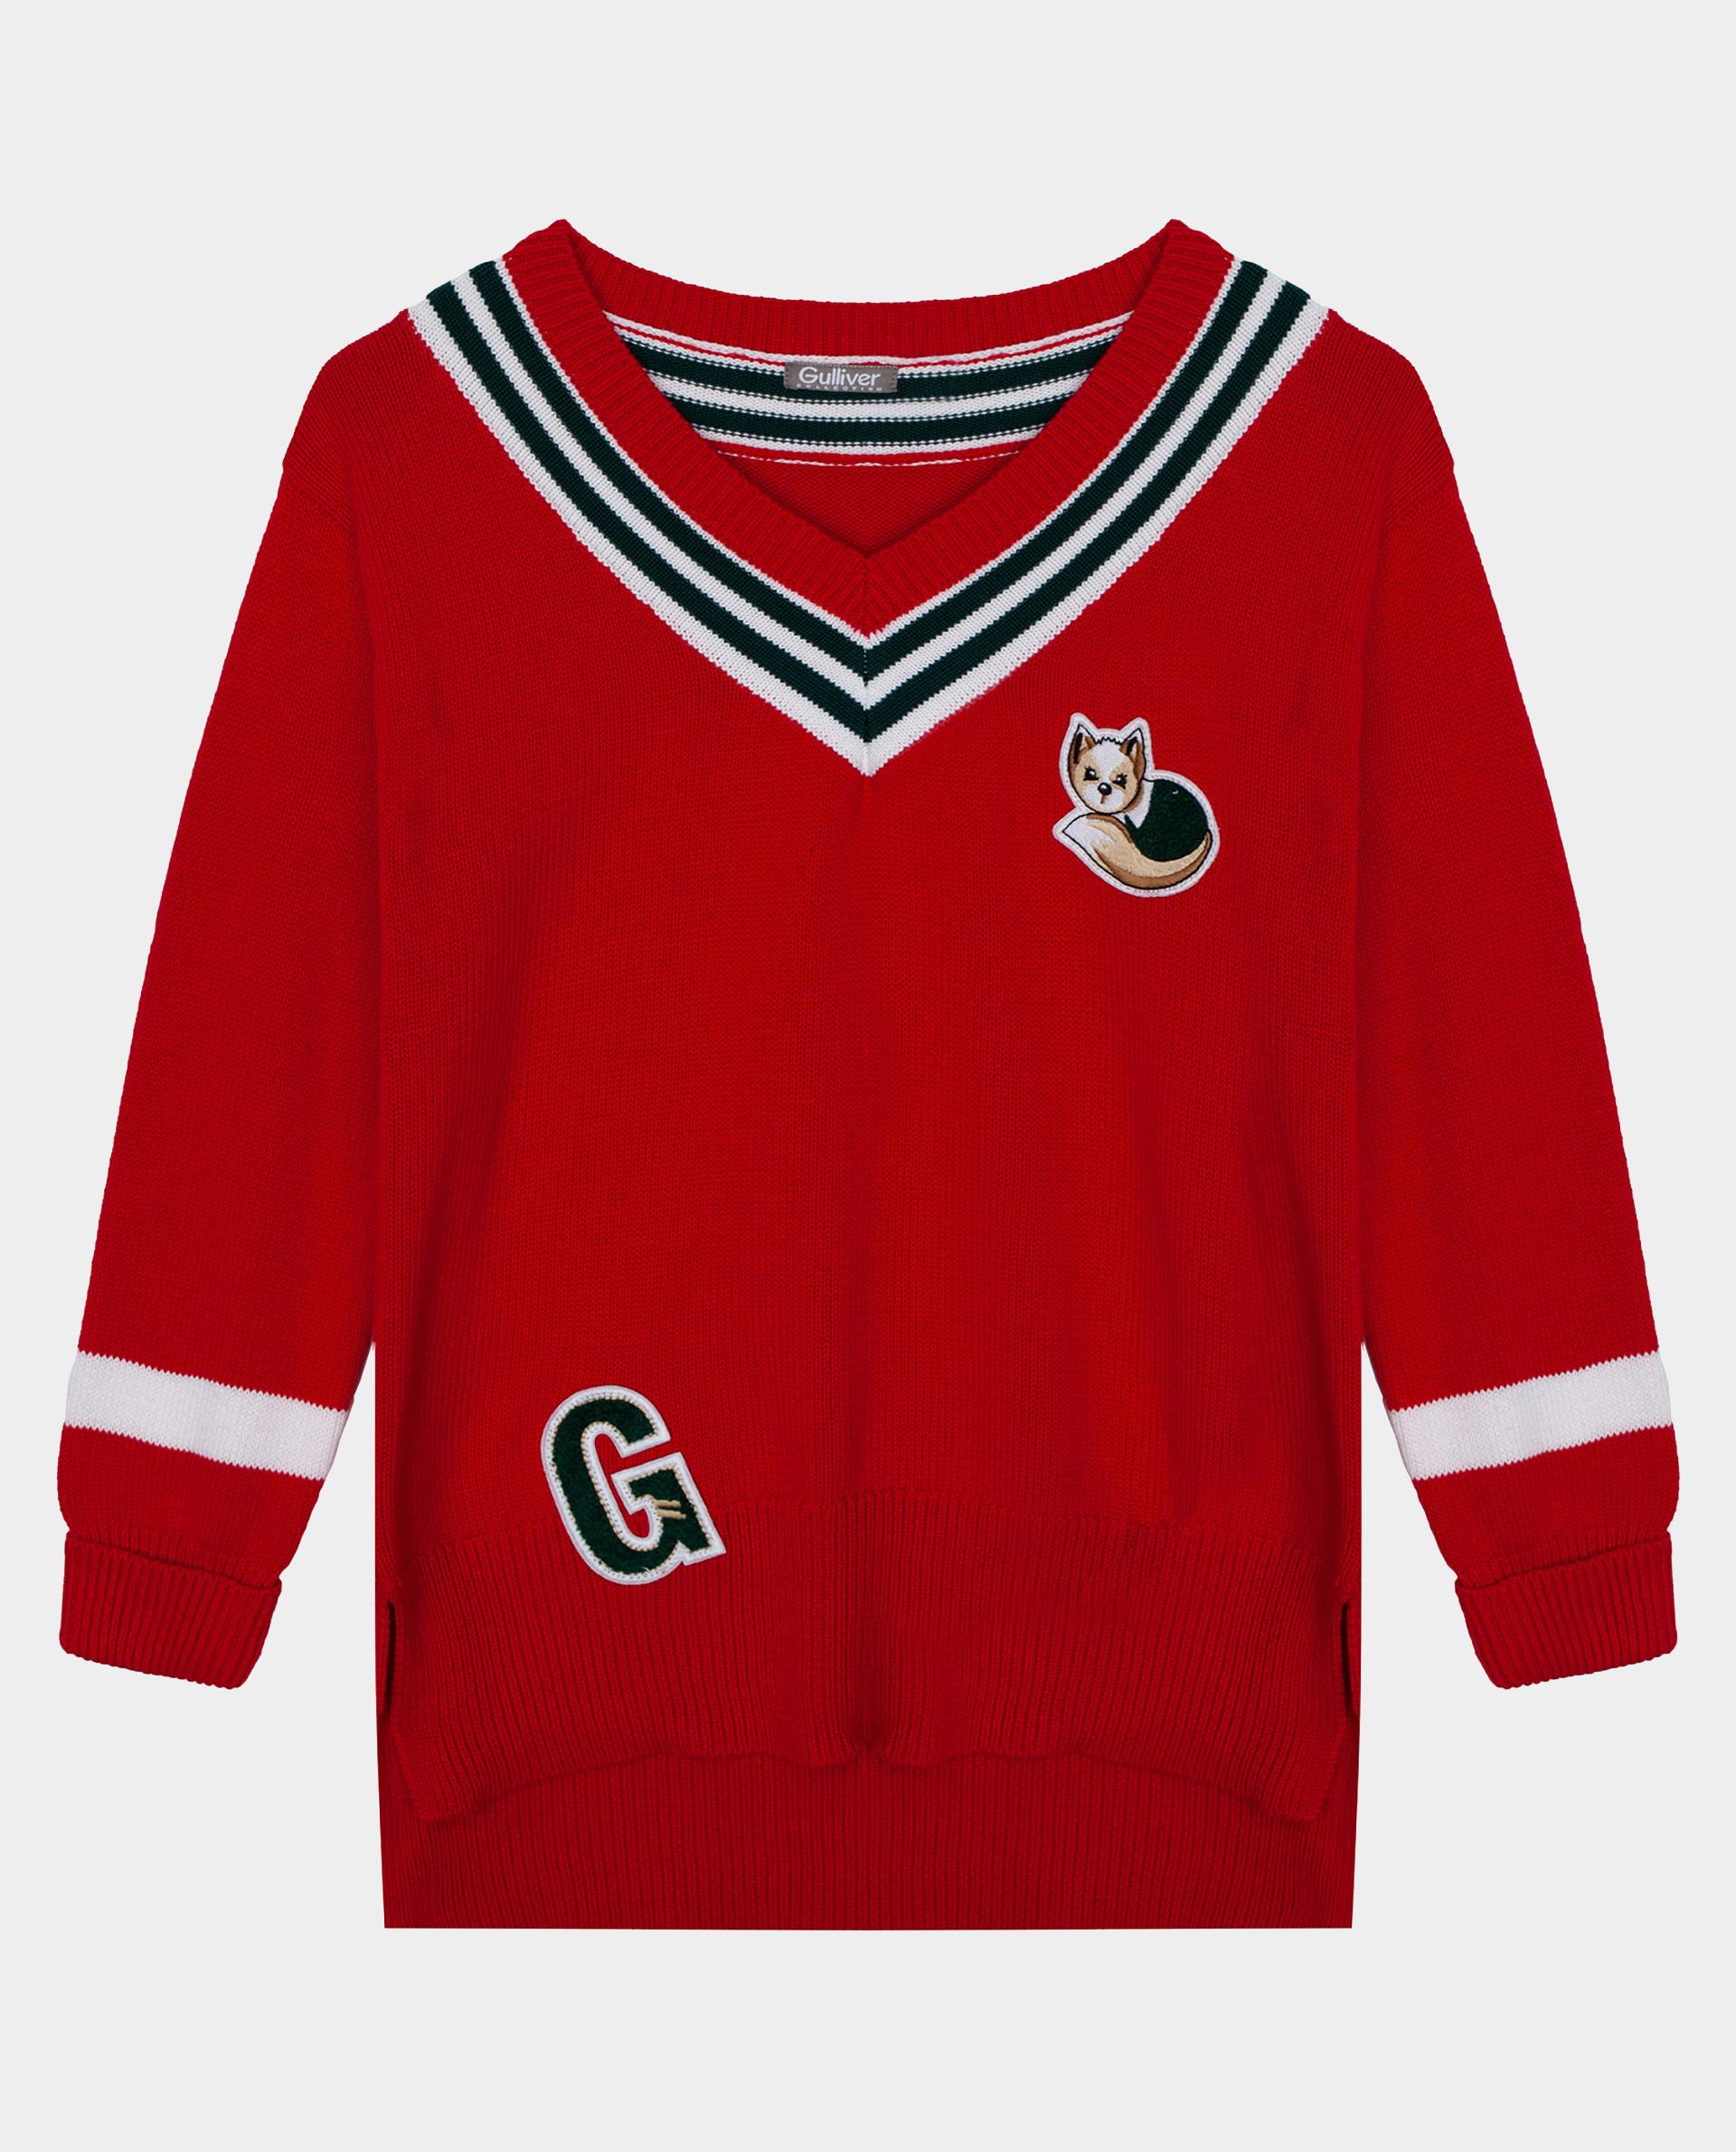 Красный джемпер Gulliver размер 110*56*51 22002GMC3101